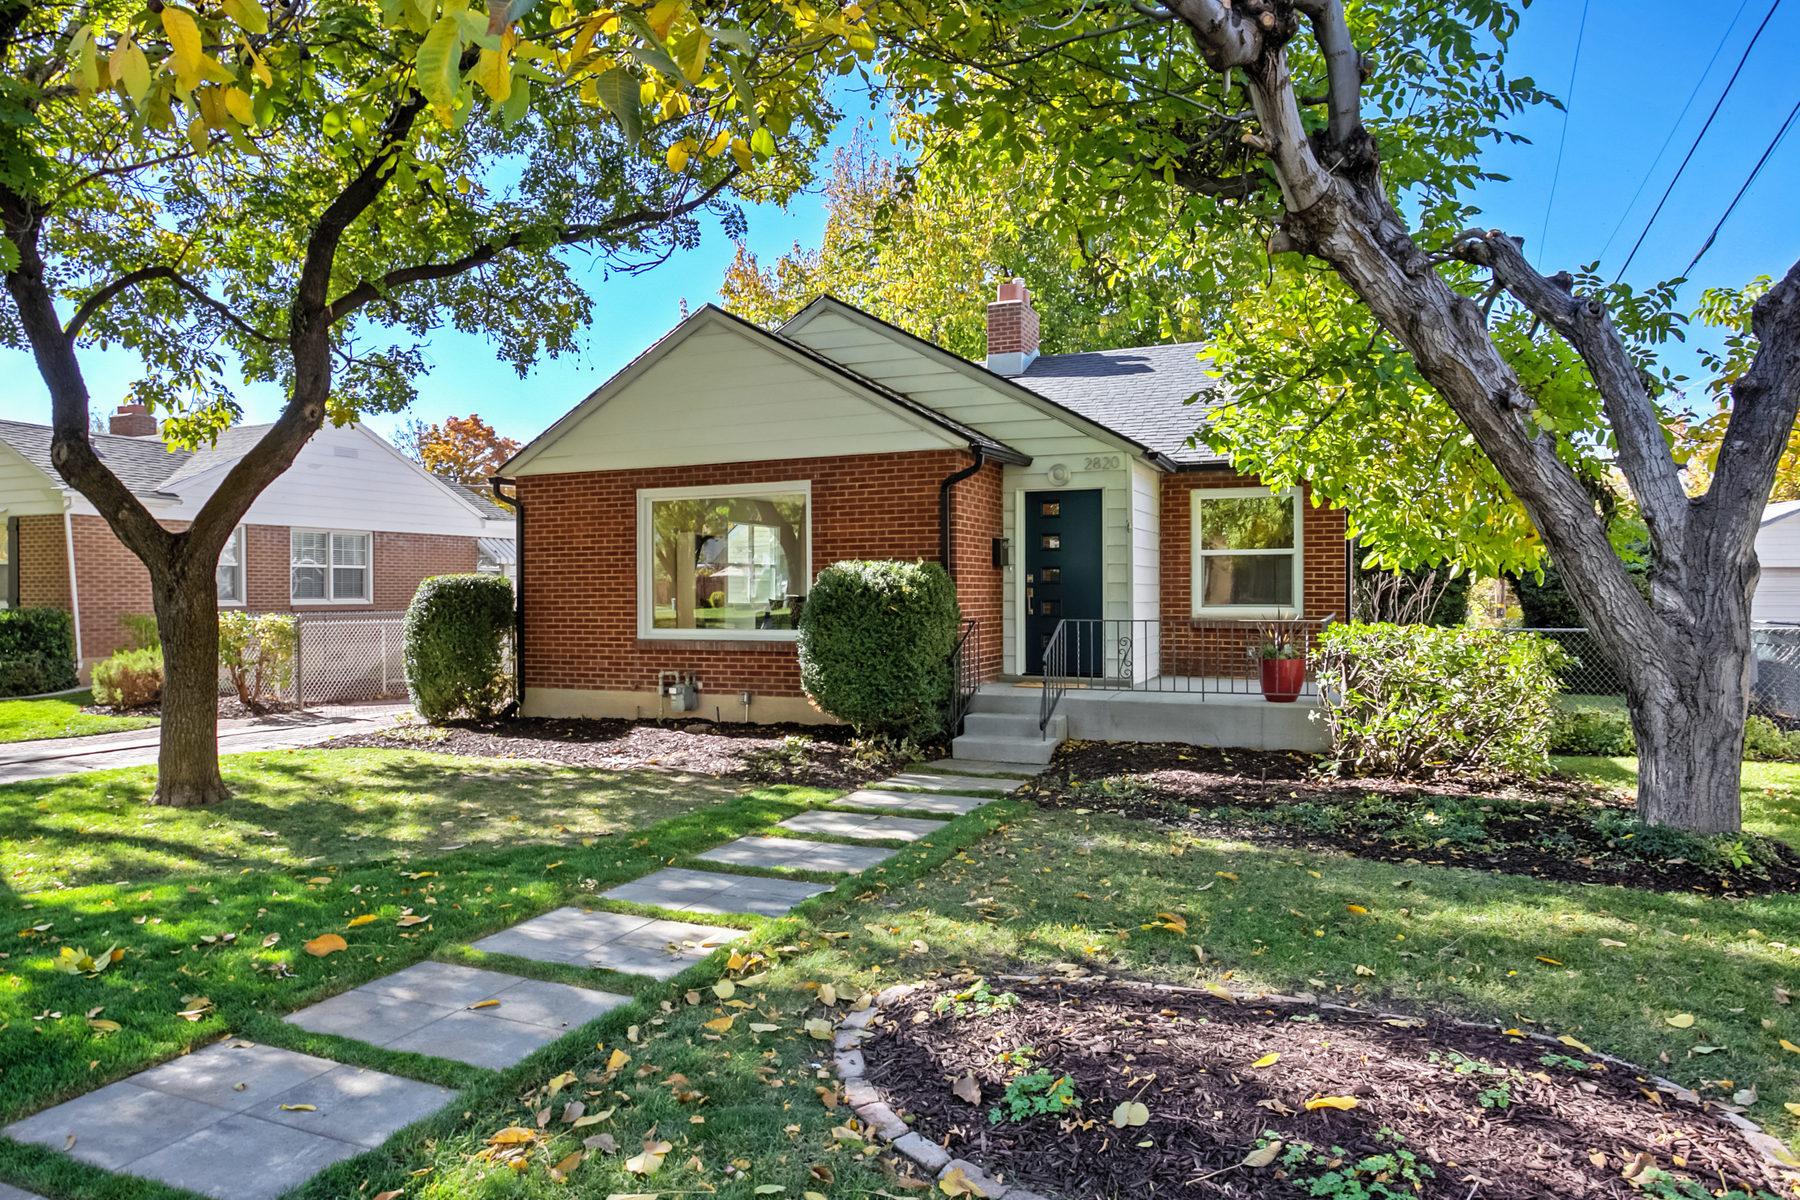 獨棟家庭住宅 為 出售 在 Home Sweet Hartford in Sugarhouse 2820 S Hartford St Salt Lake City, 猶他州, 84106 美國